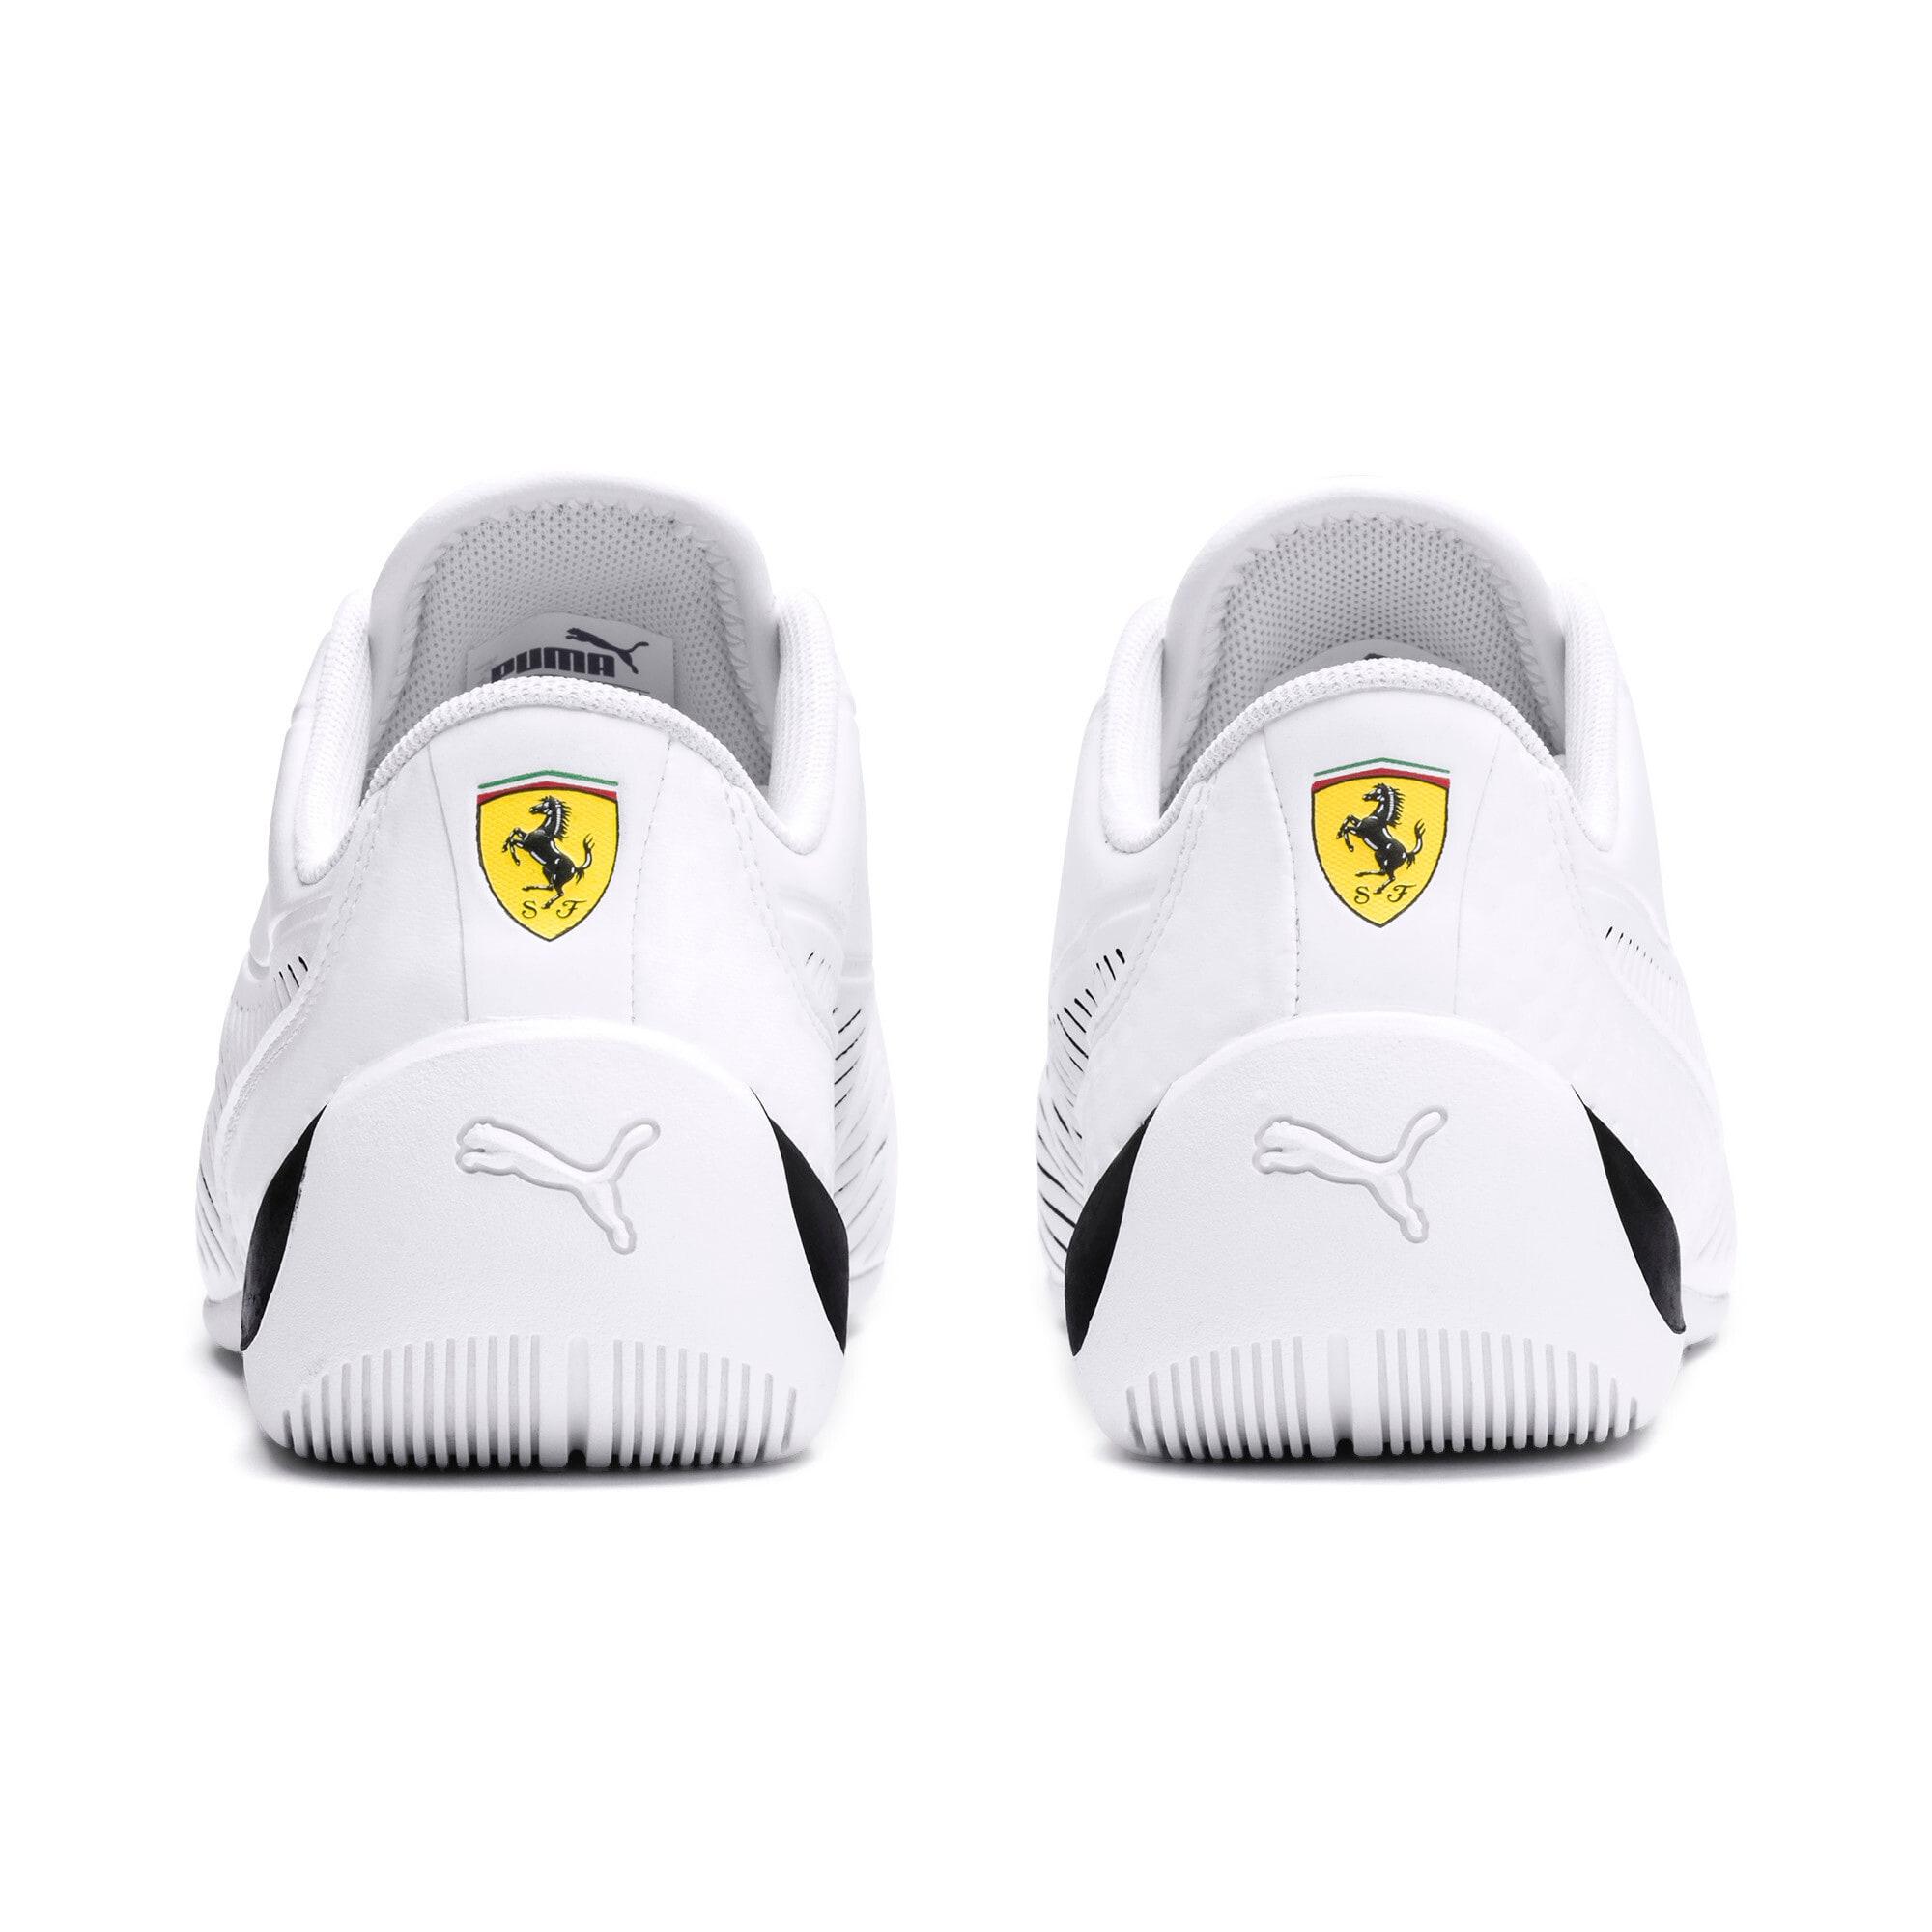 Thumbnail 3 of Scuderia Ferrari Drift Cat 7S Ultra Shoes JR, Puma White-Puma Black, medium